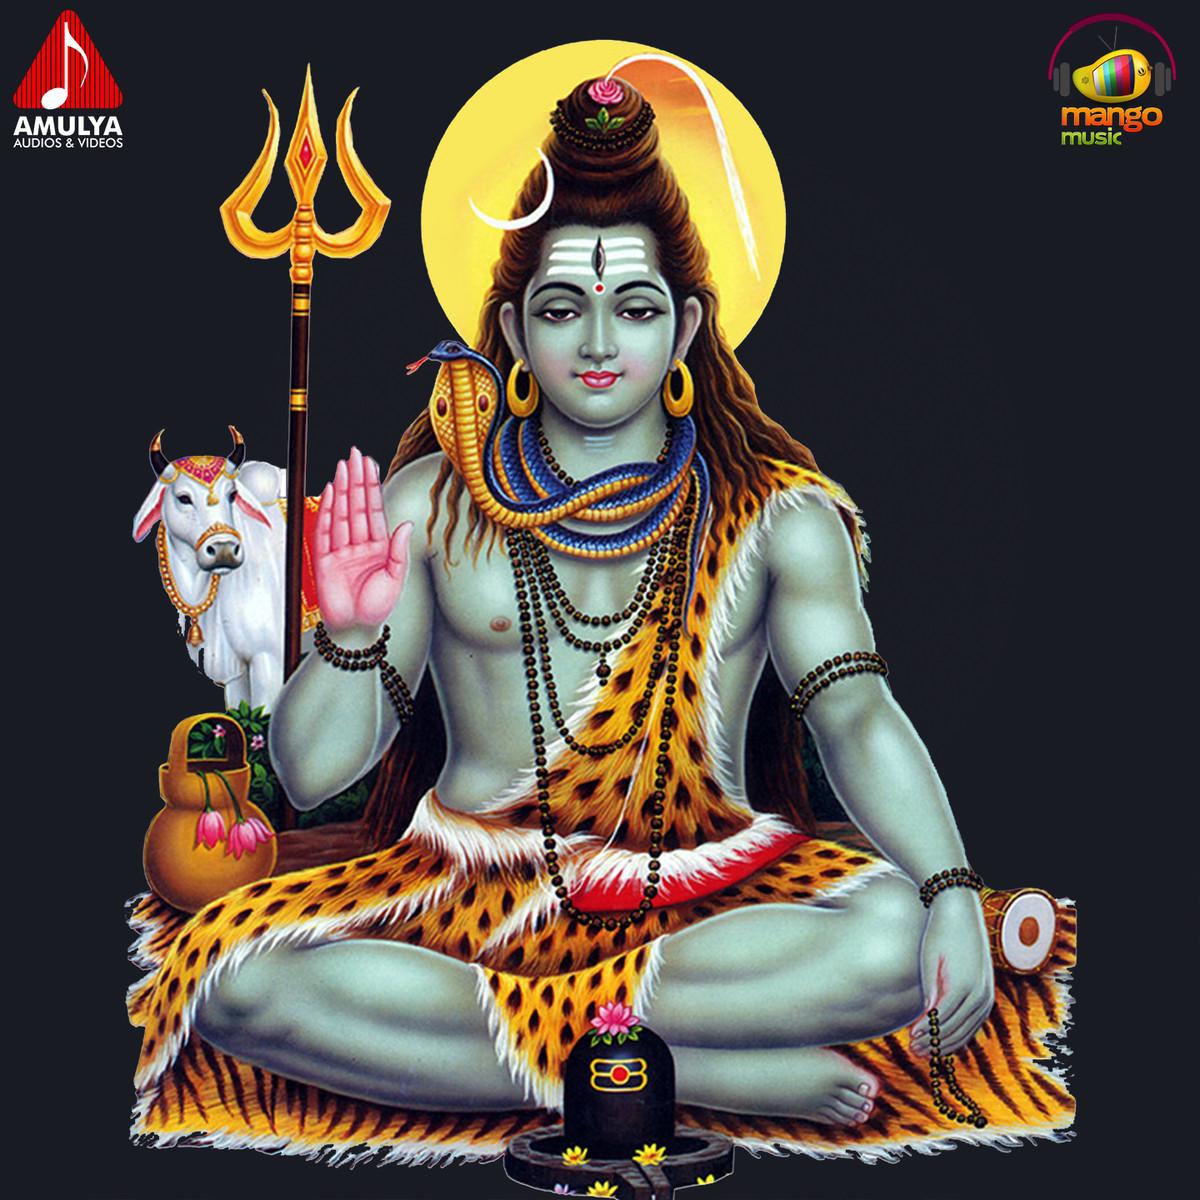 Lord Shiva Songs Download Lord Shiva Mp3 Telugu Songs Online Free On Gaana Com